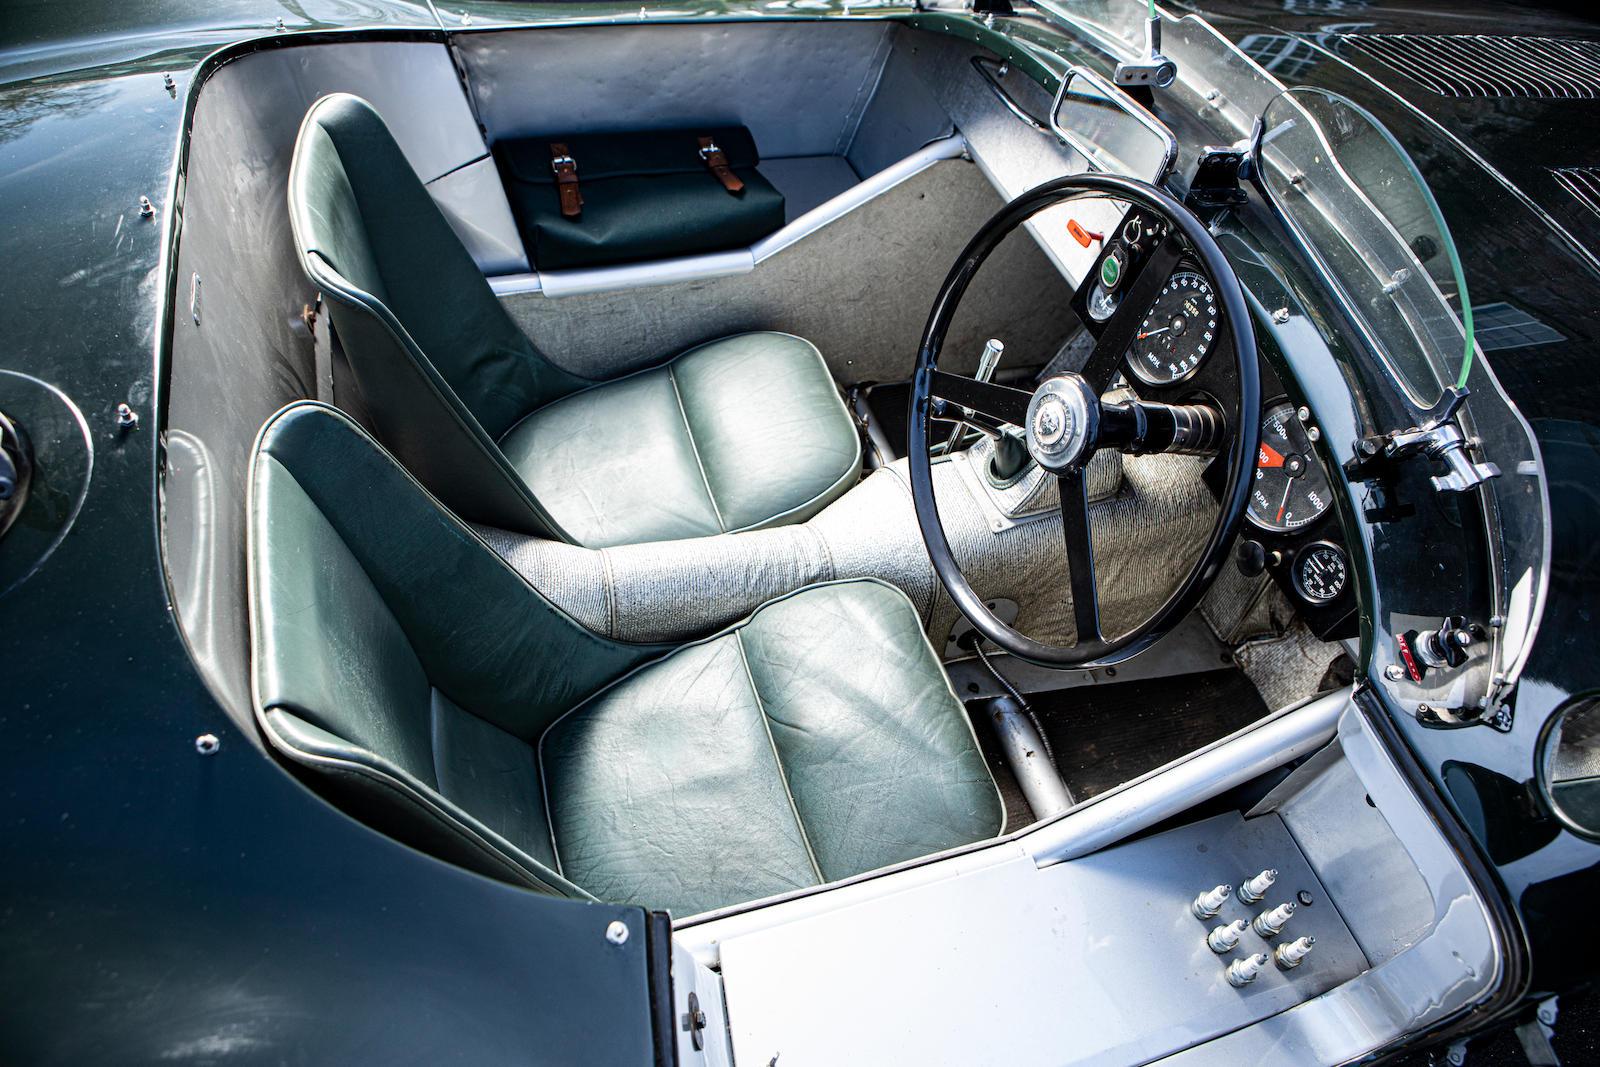 1952 Jaguar XK120 C-Type seats